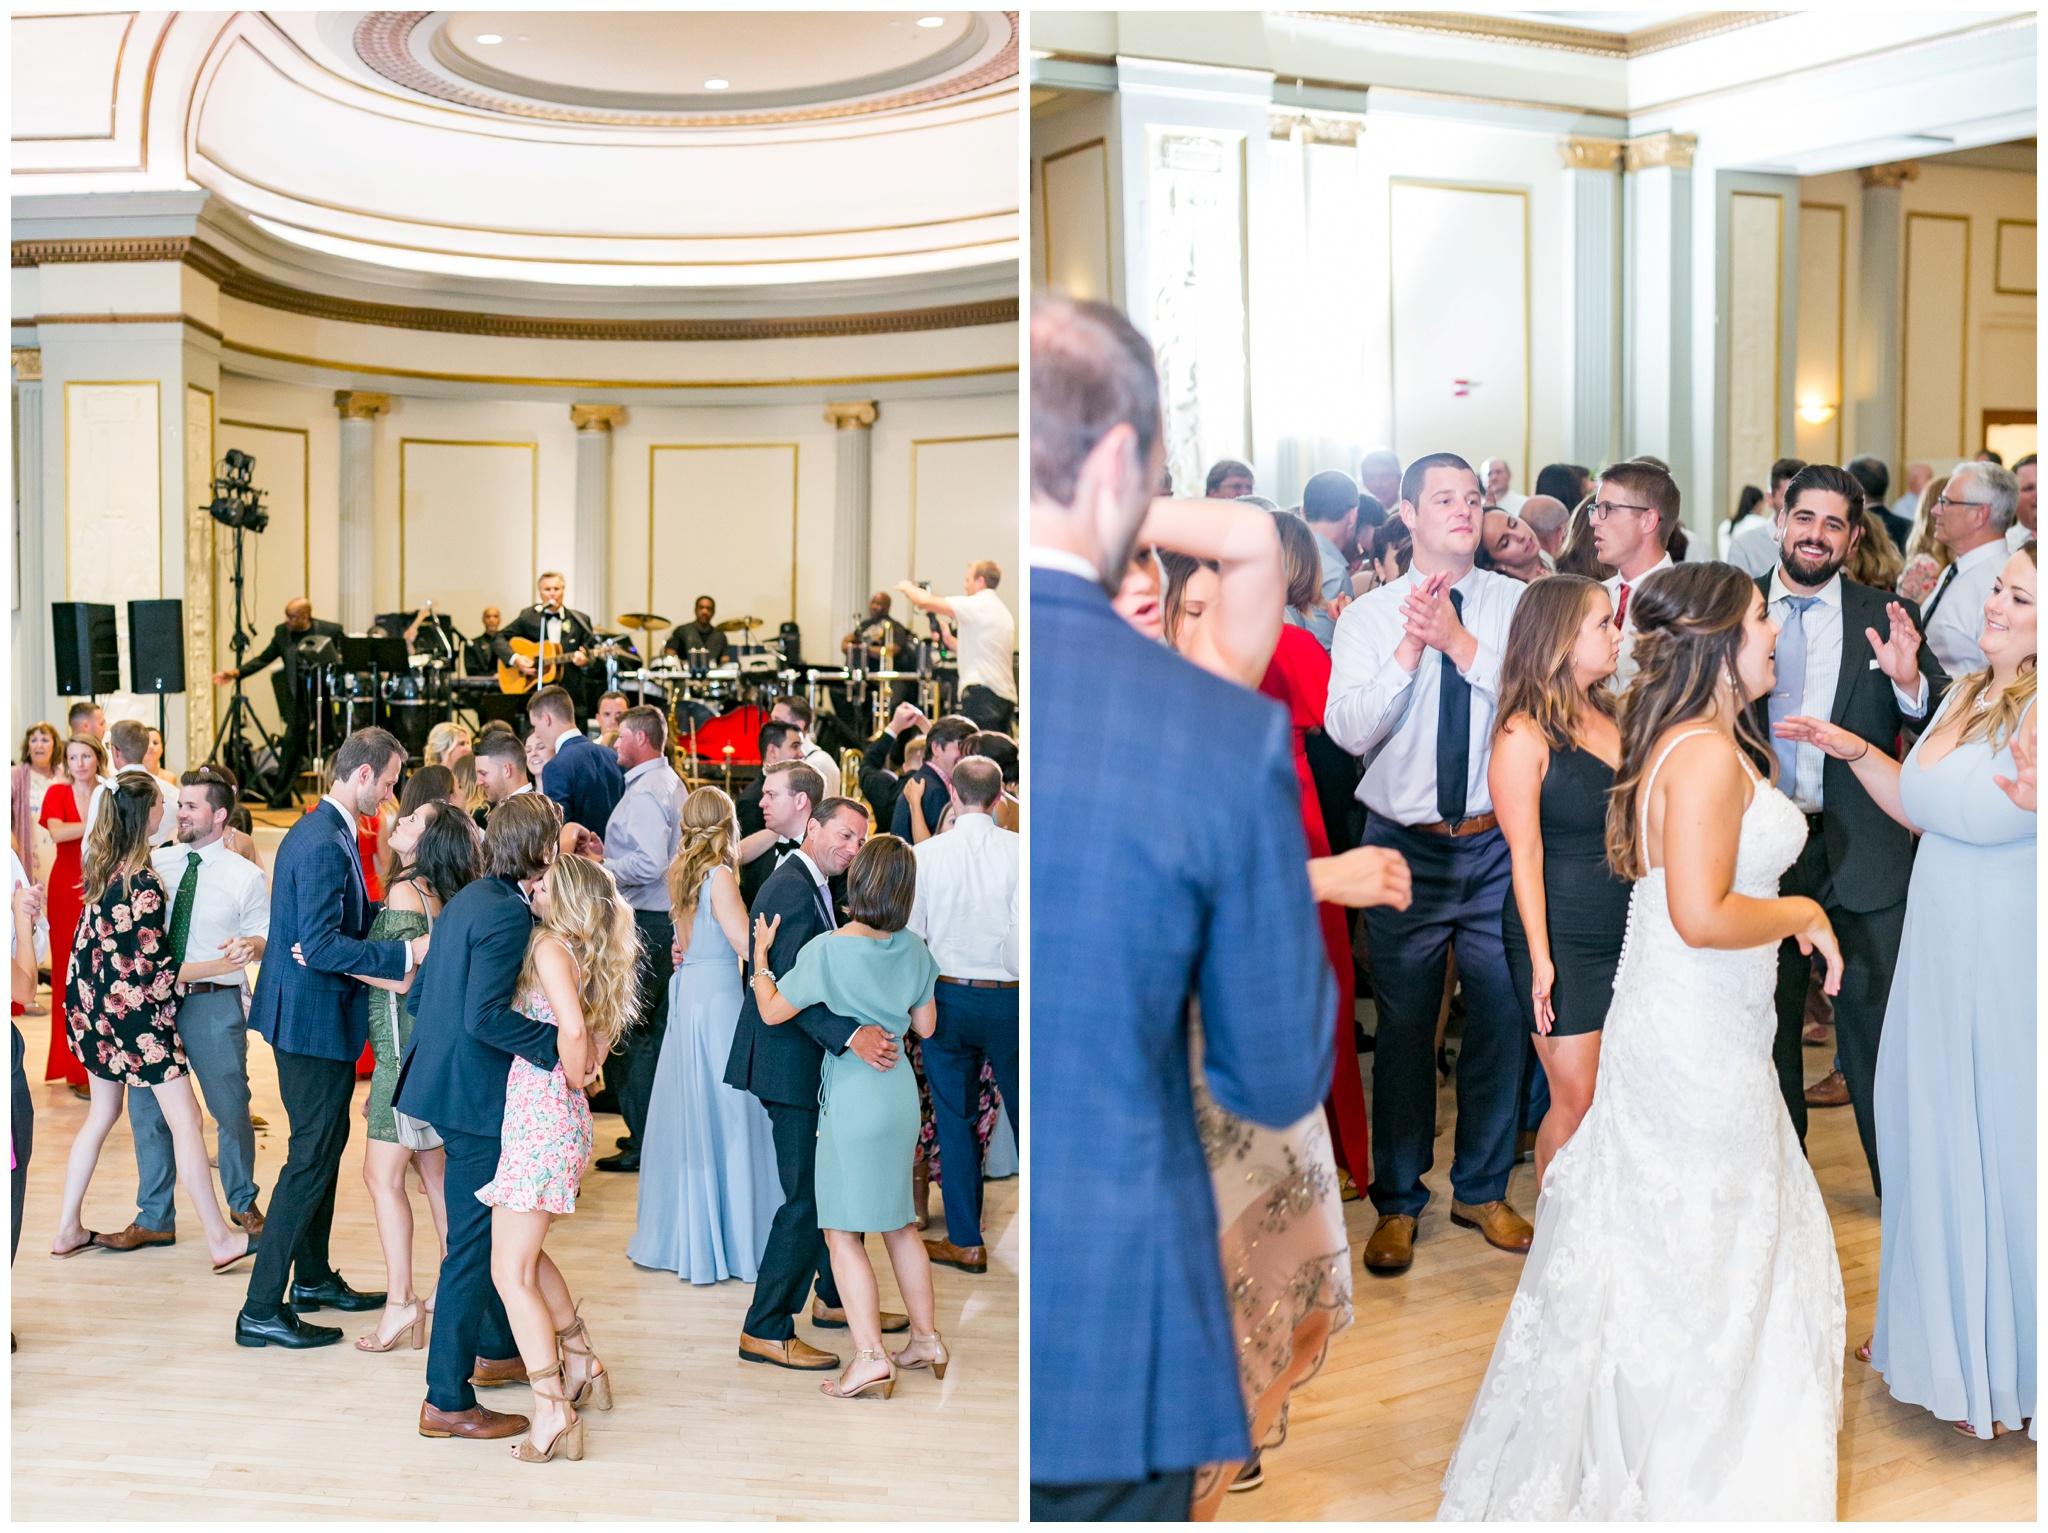 UW_Memorial_Union_wedding_madison_wisconsin_wedding_photographers_4650.jpg